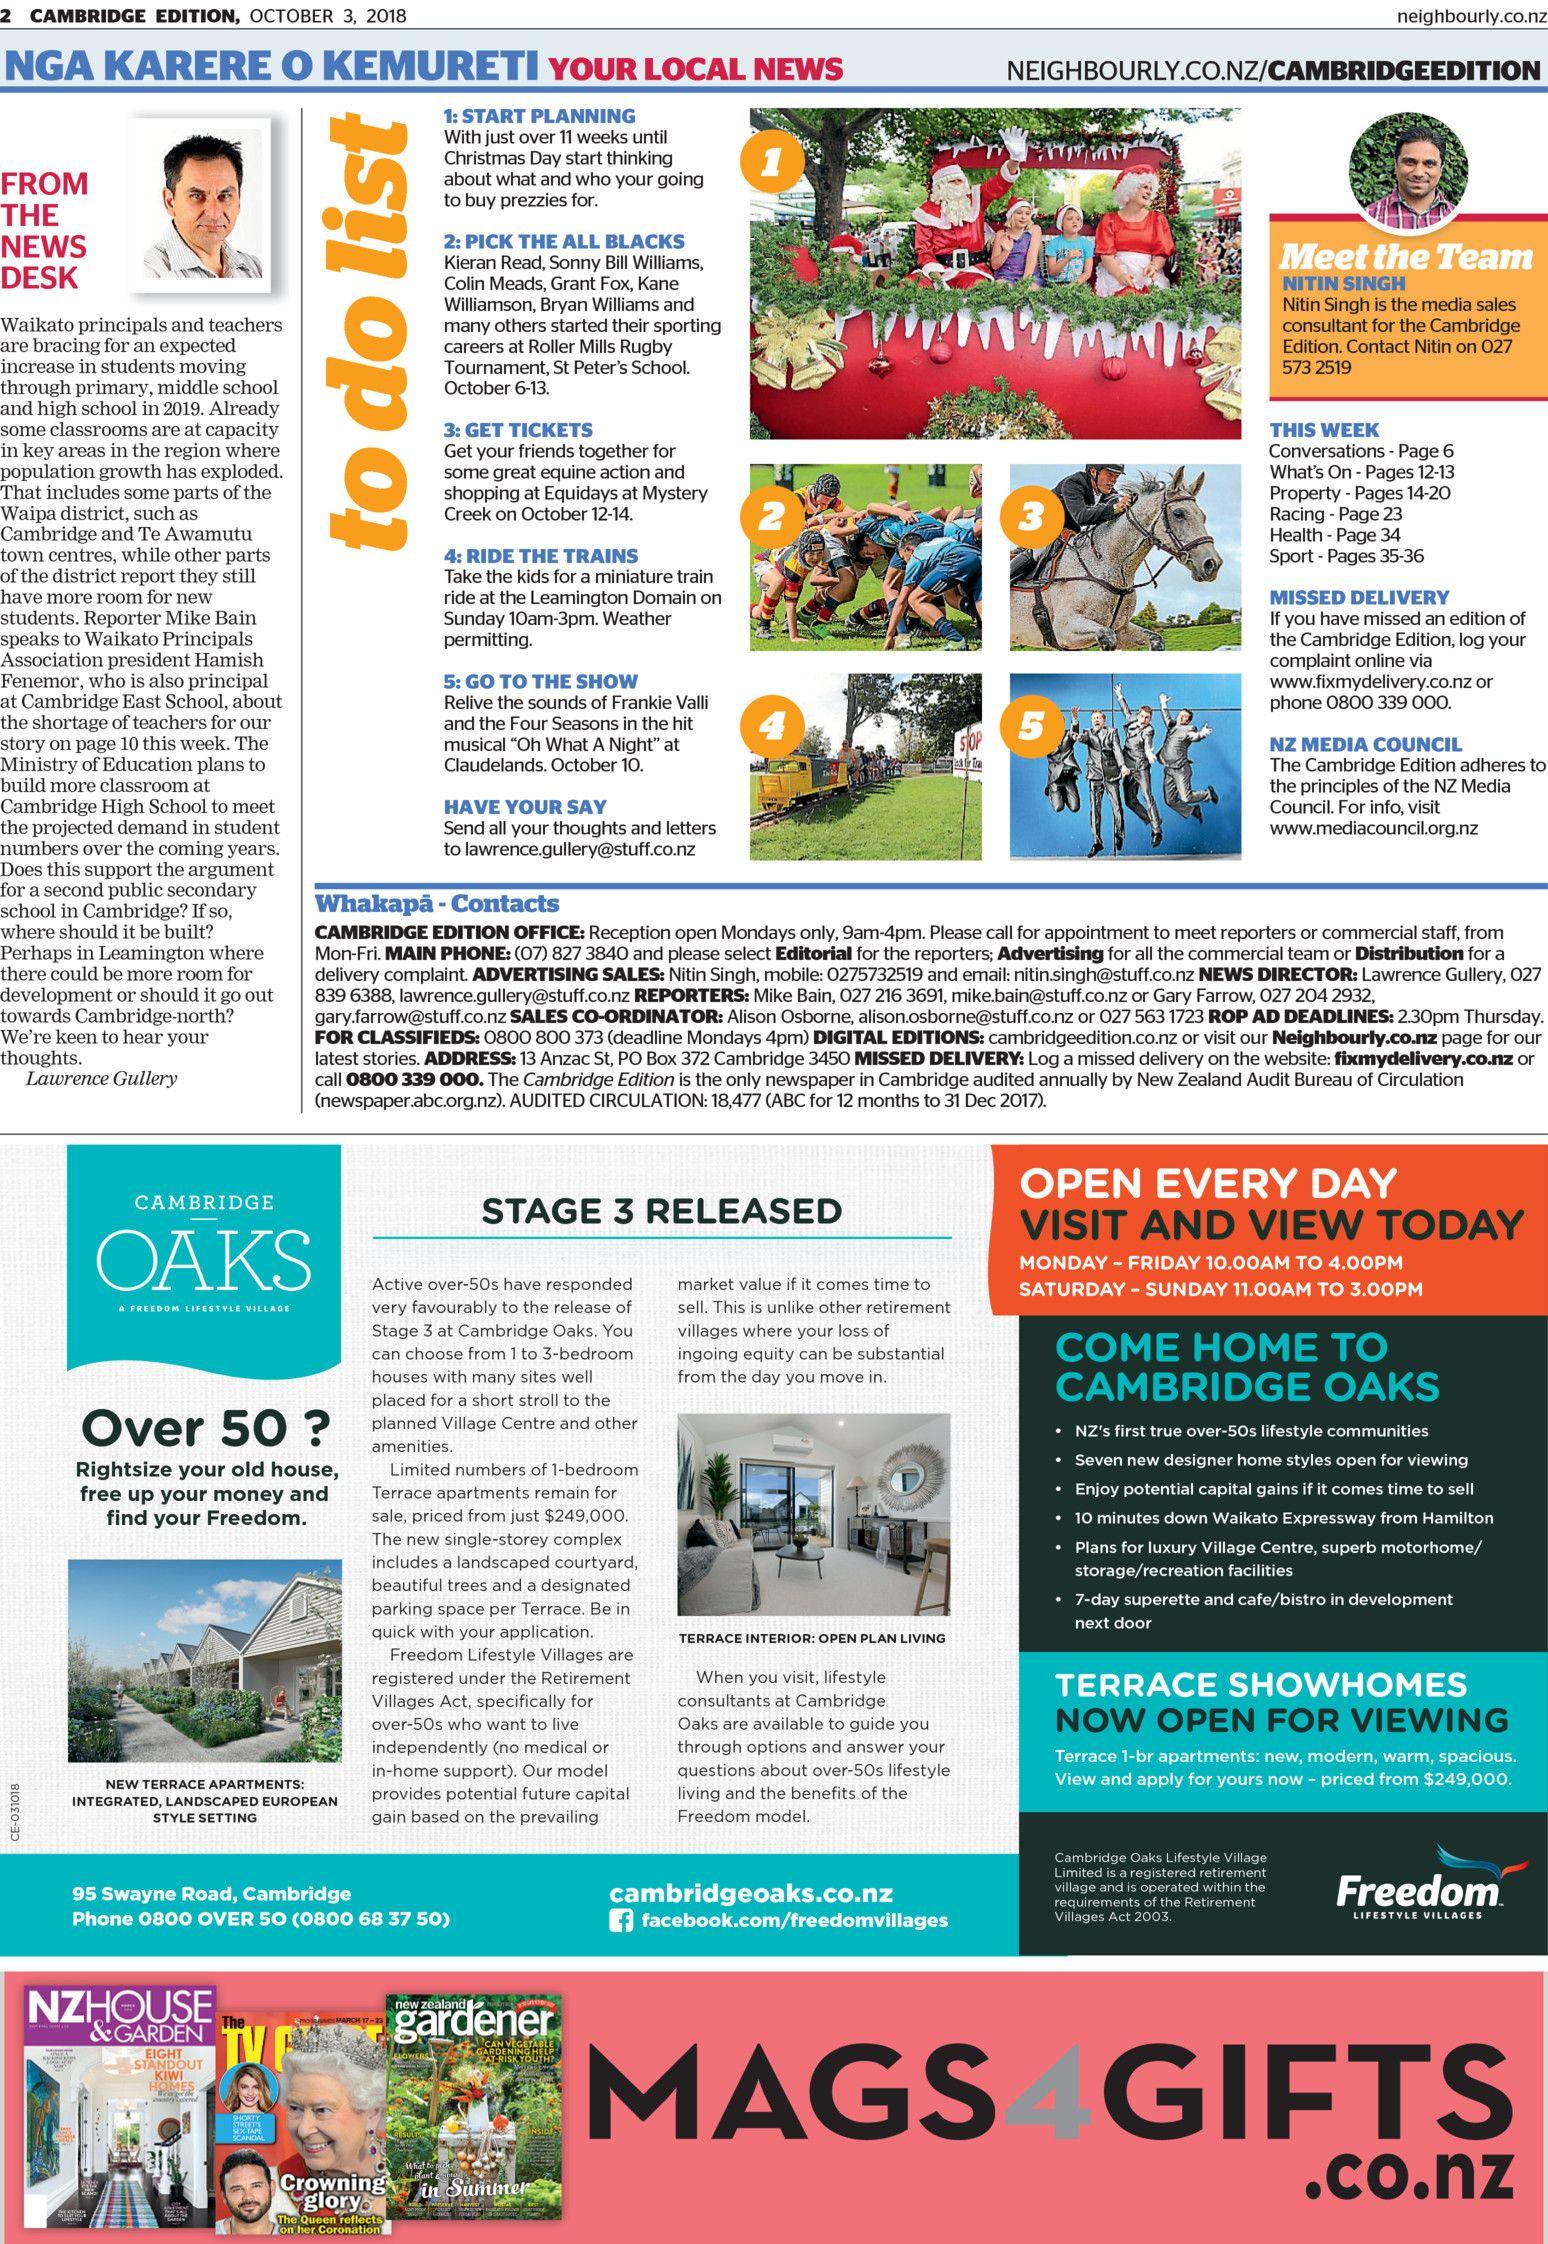 Cambridge Edition Read online on Neighbourly